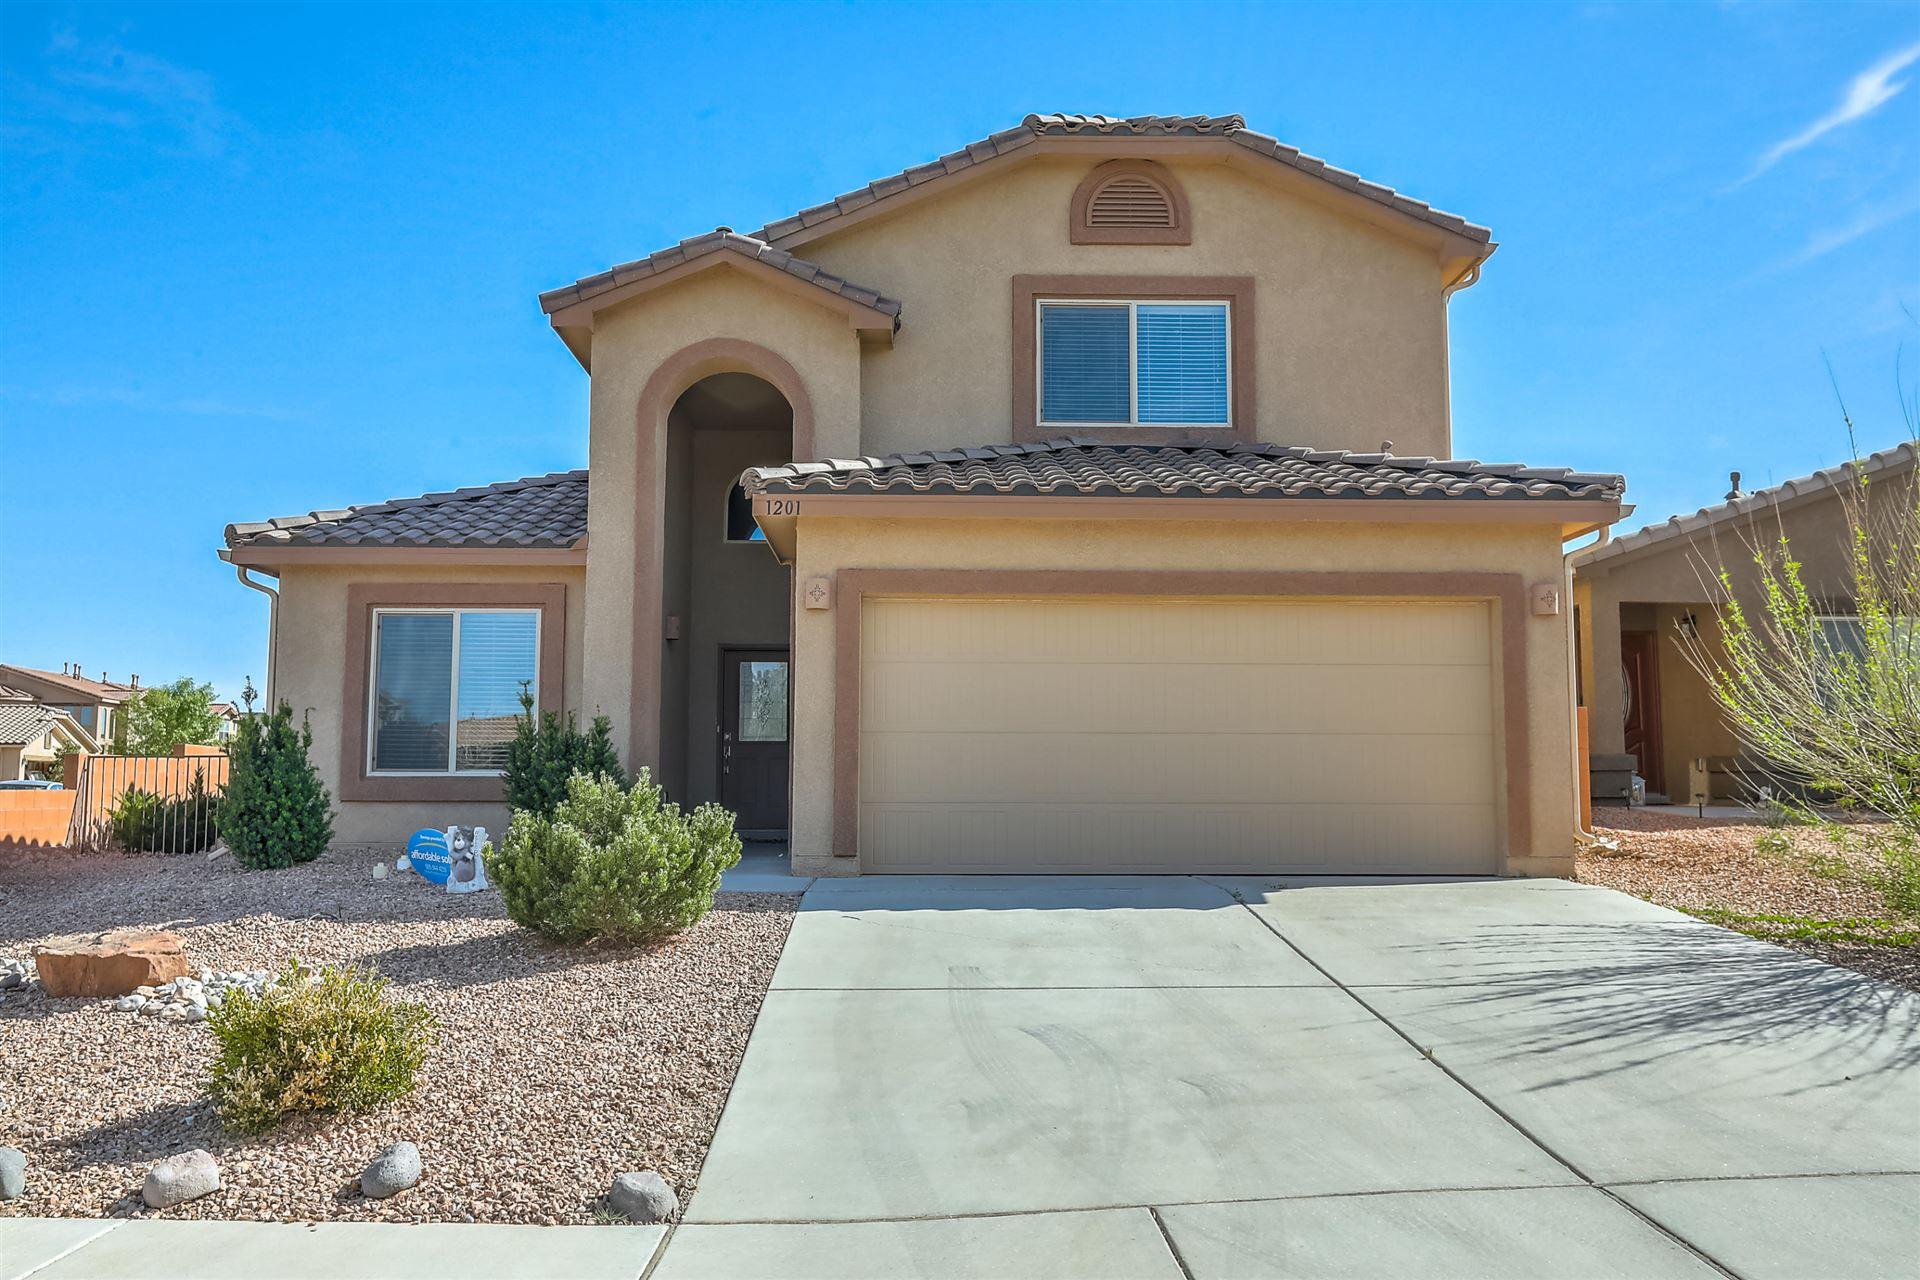 Photo of 1201 SAN LUIS Street, Bernalillo, NM 87004 (MLS # 967760)